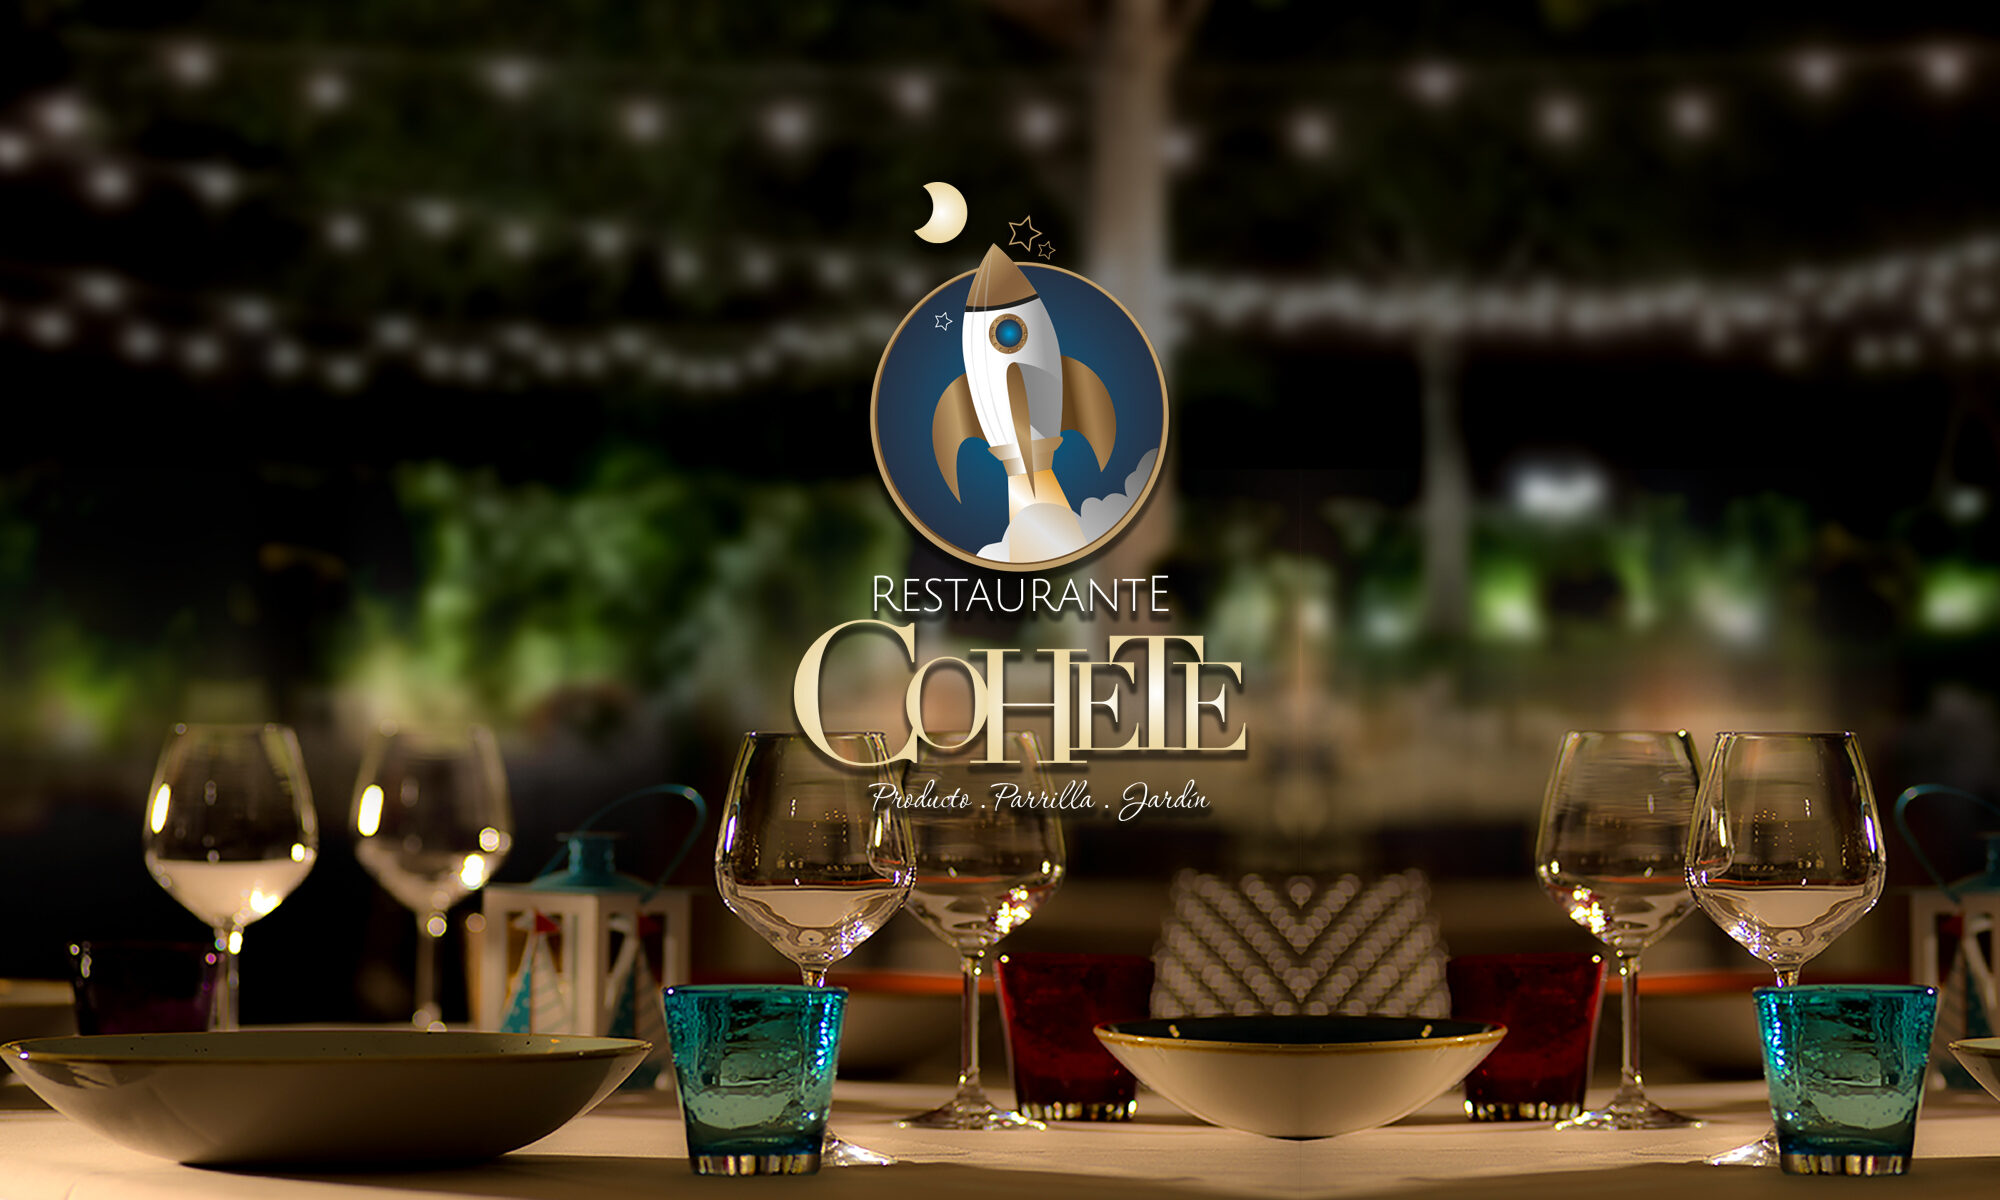 Restaurante Cohete